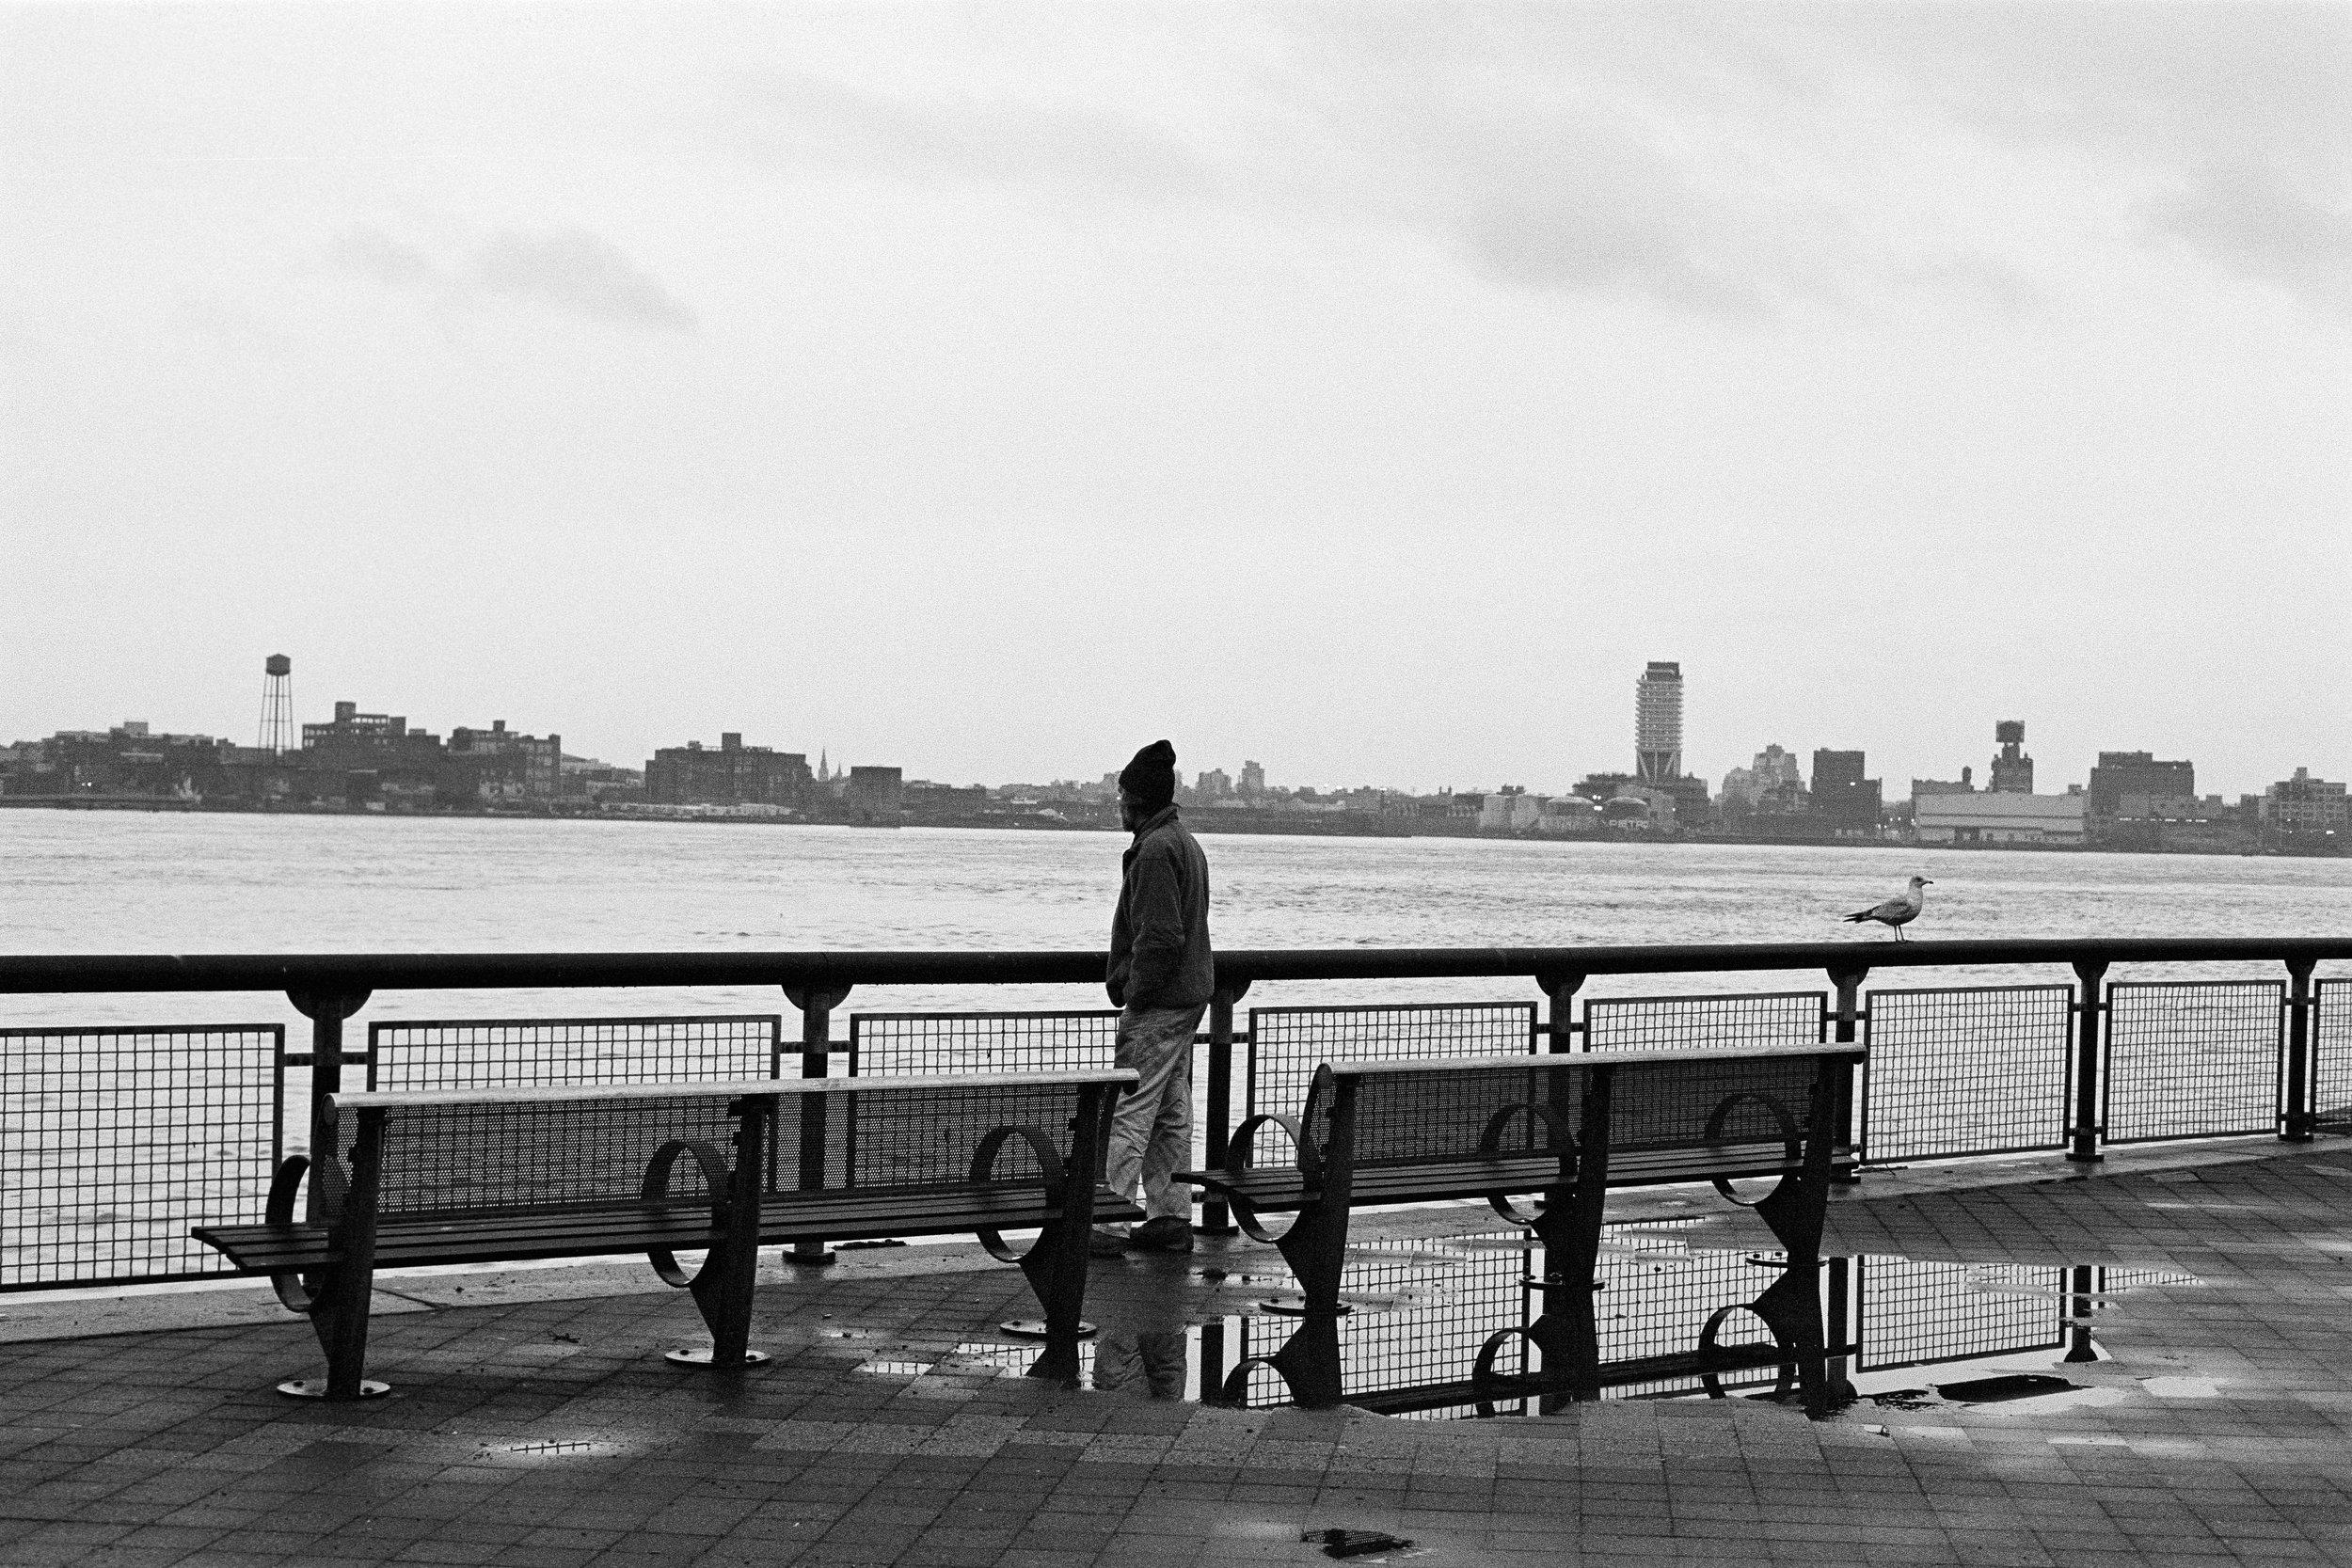 Cold and wet | Nikon F80 | Delta 400 | Joel Kaswan